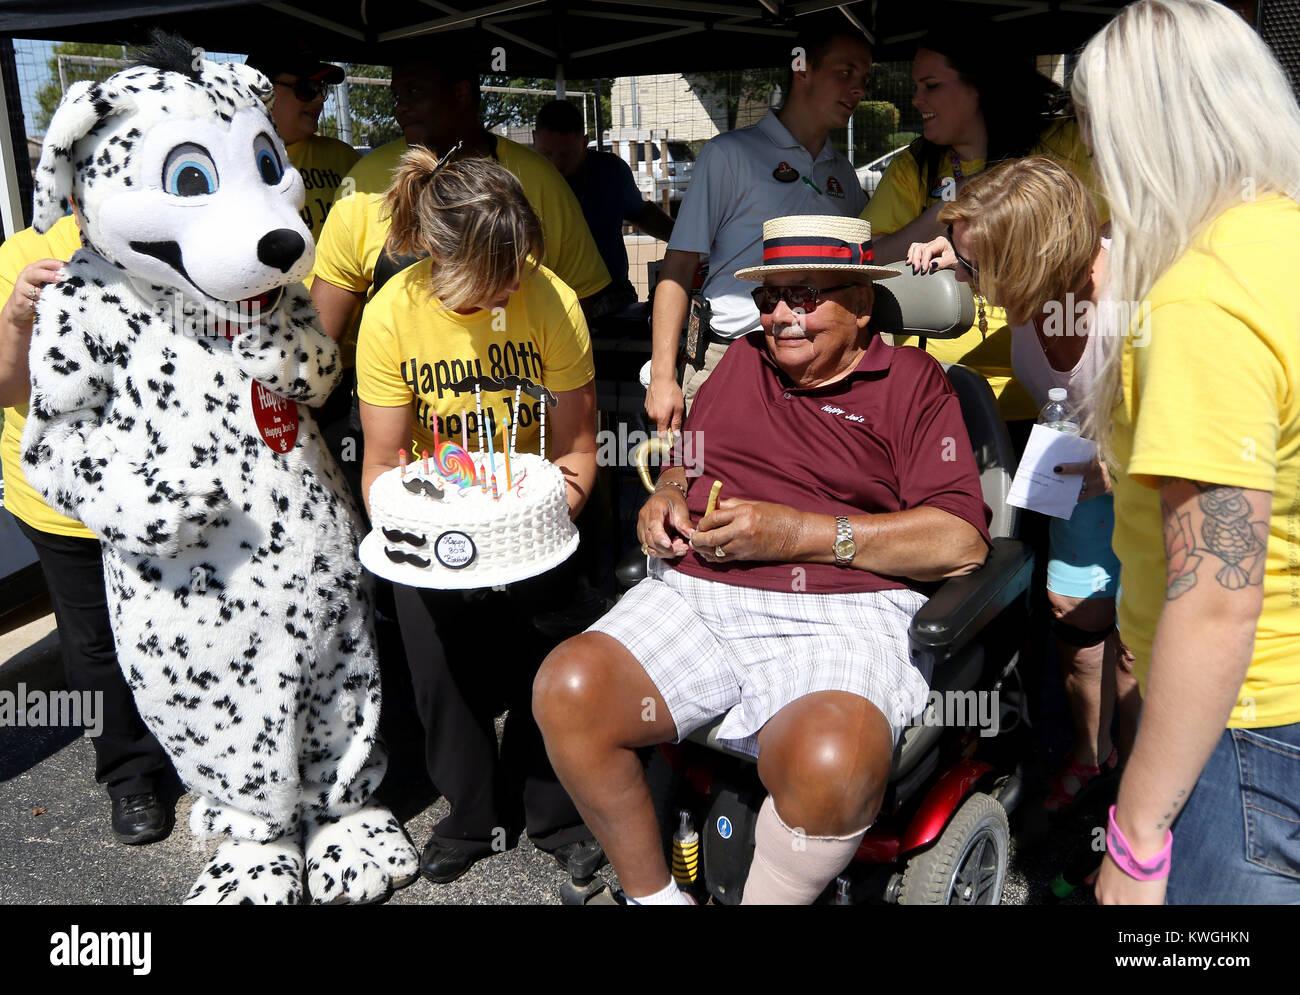 Eldridge, Iowa, USA. 10th Sep, 2017. Happy Joe Whitty, founder of Happy Joe's Pizza, is presented a cake, Sunday, - Stock Image